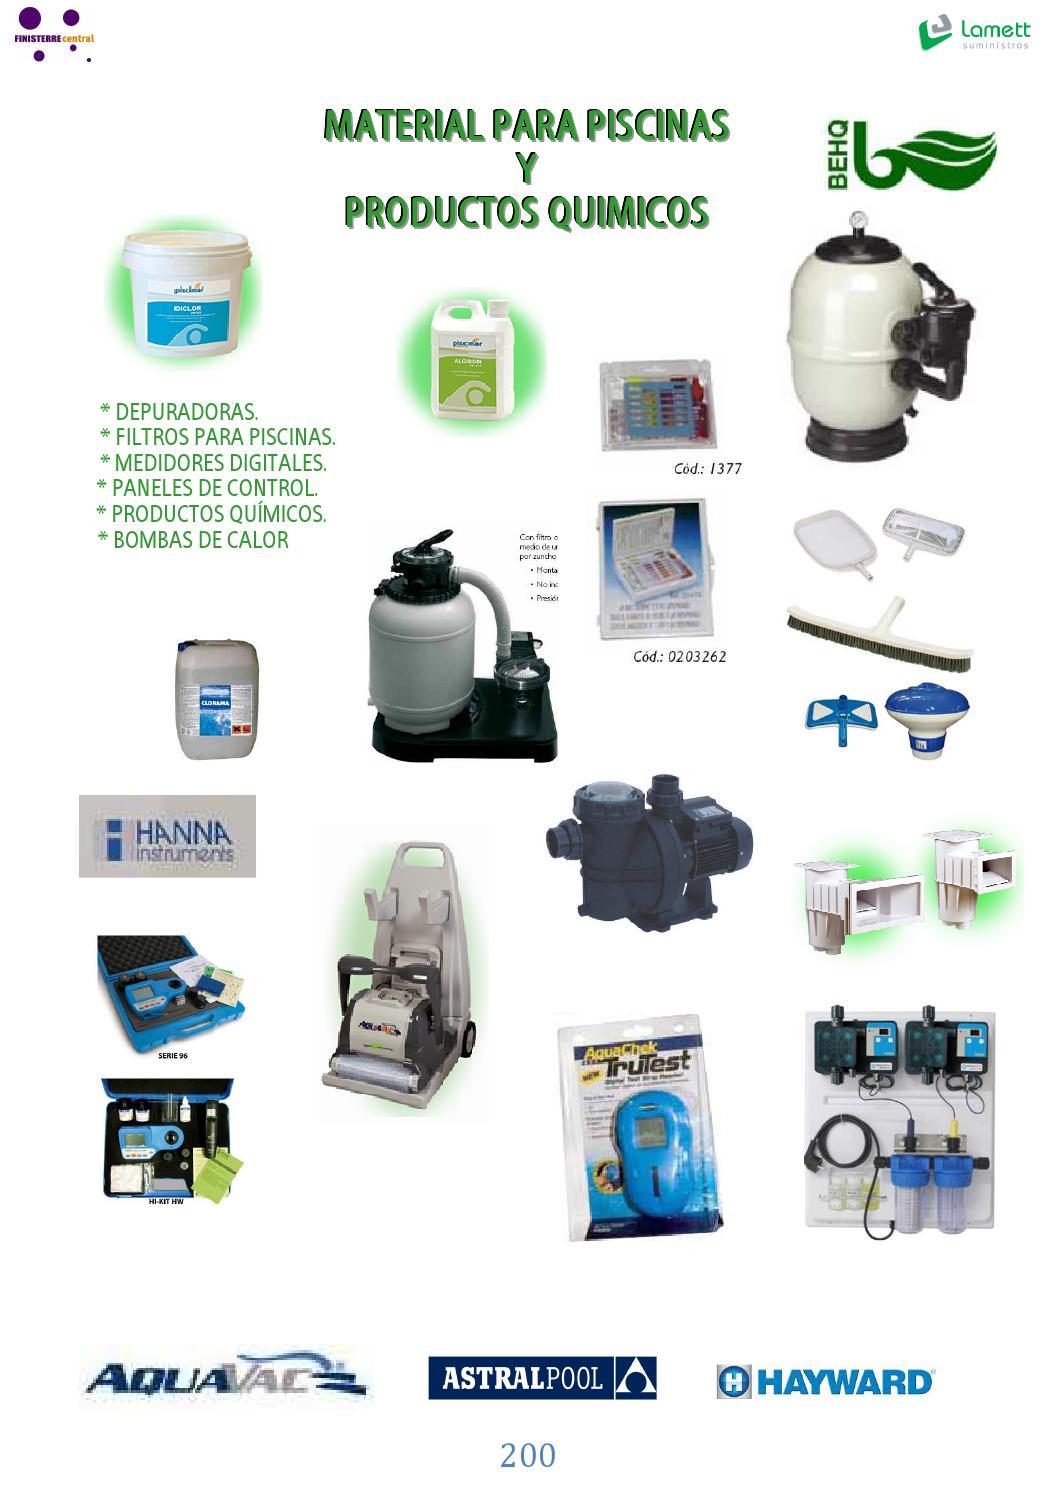 Material para piscinas material para piscinas y productos for Piscinas y productos